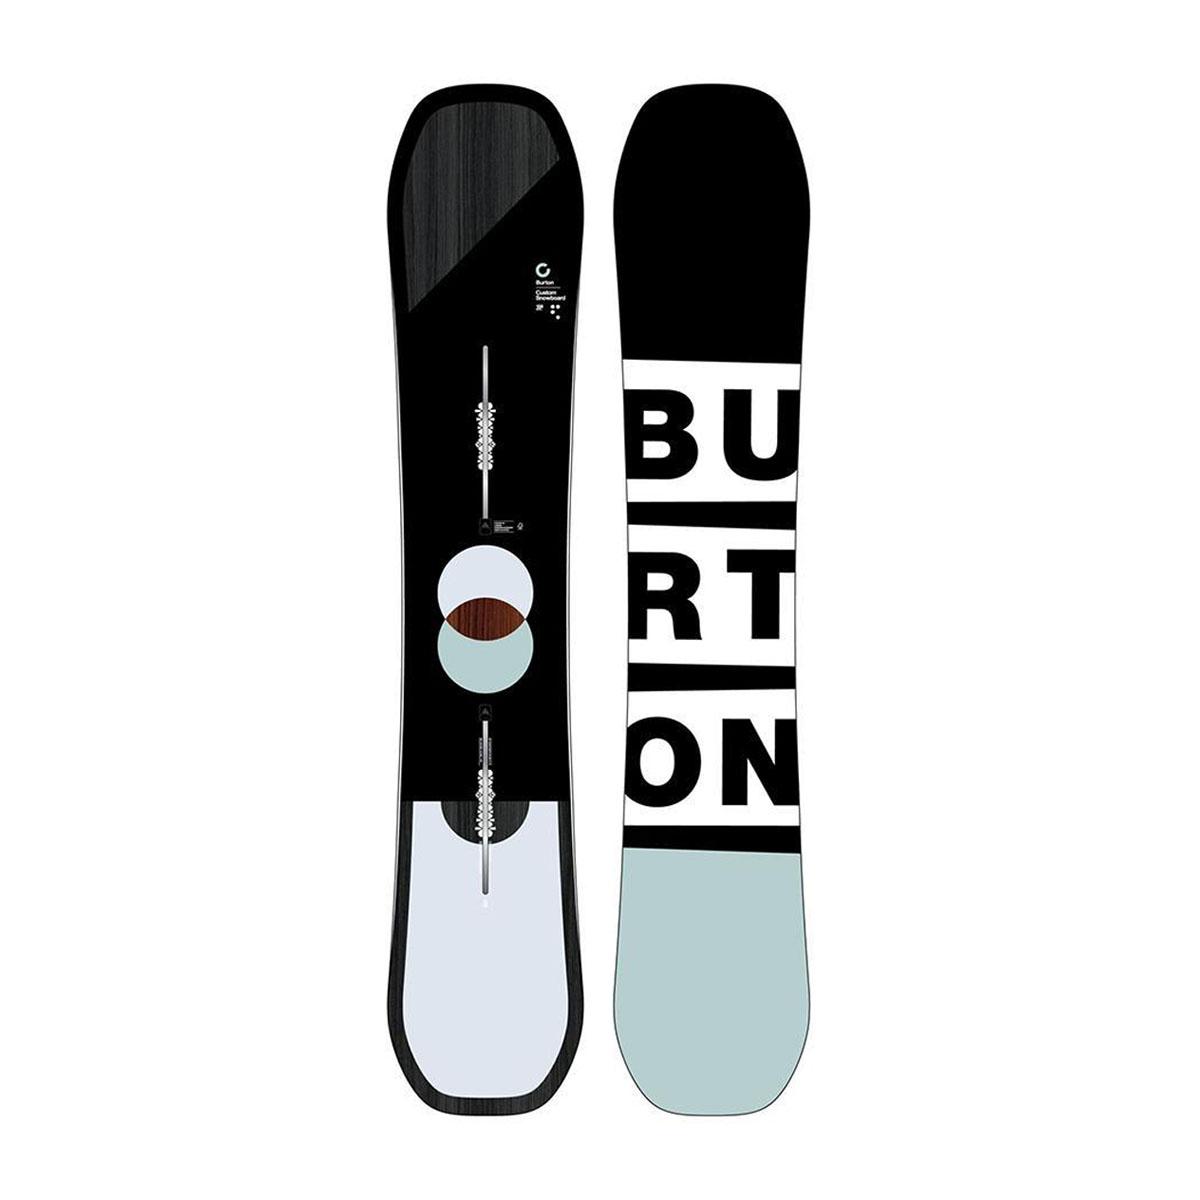 Burton CUSTOM 156 19/20